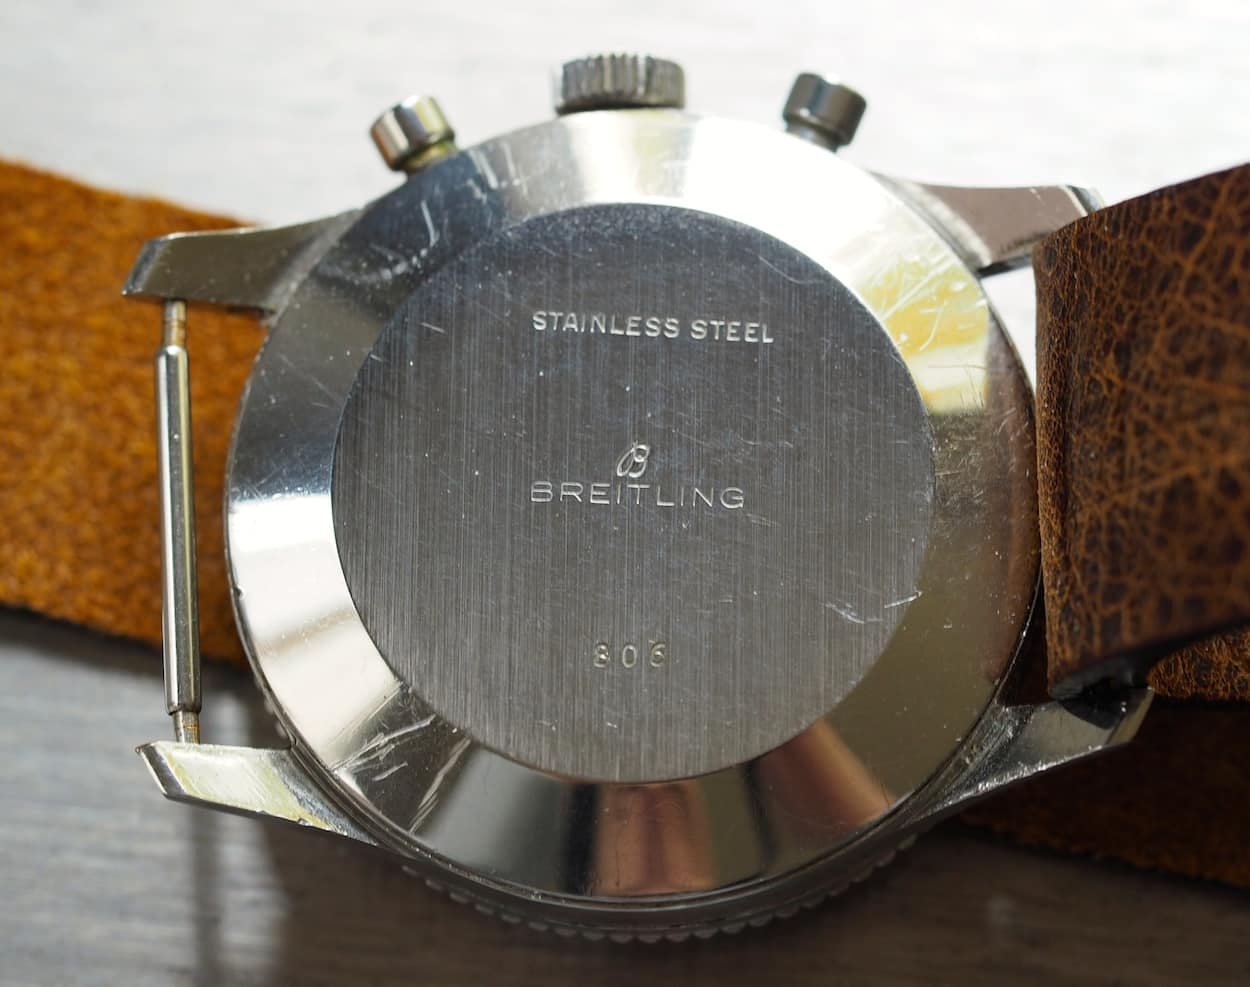 Breitling Navitimer 806 case back